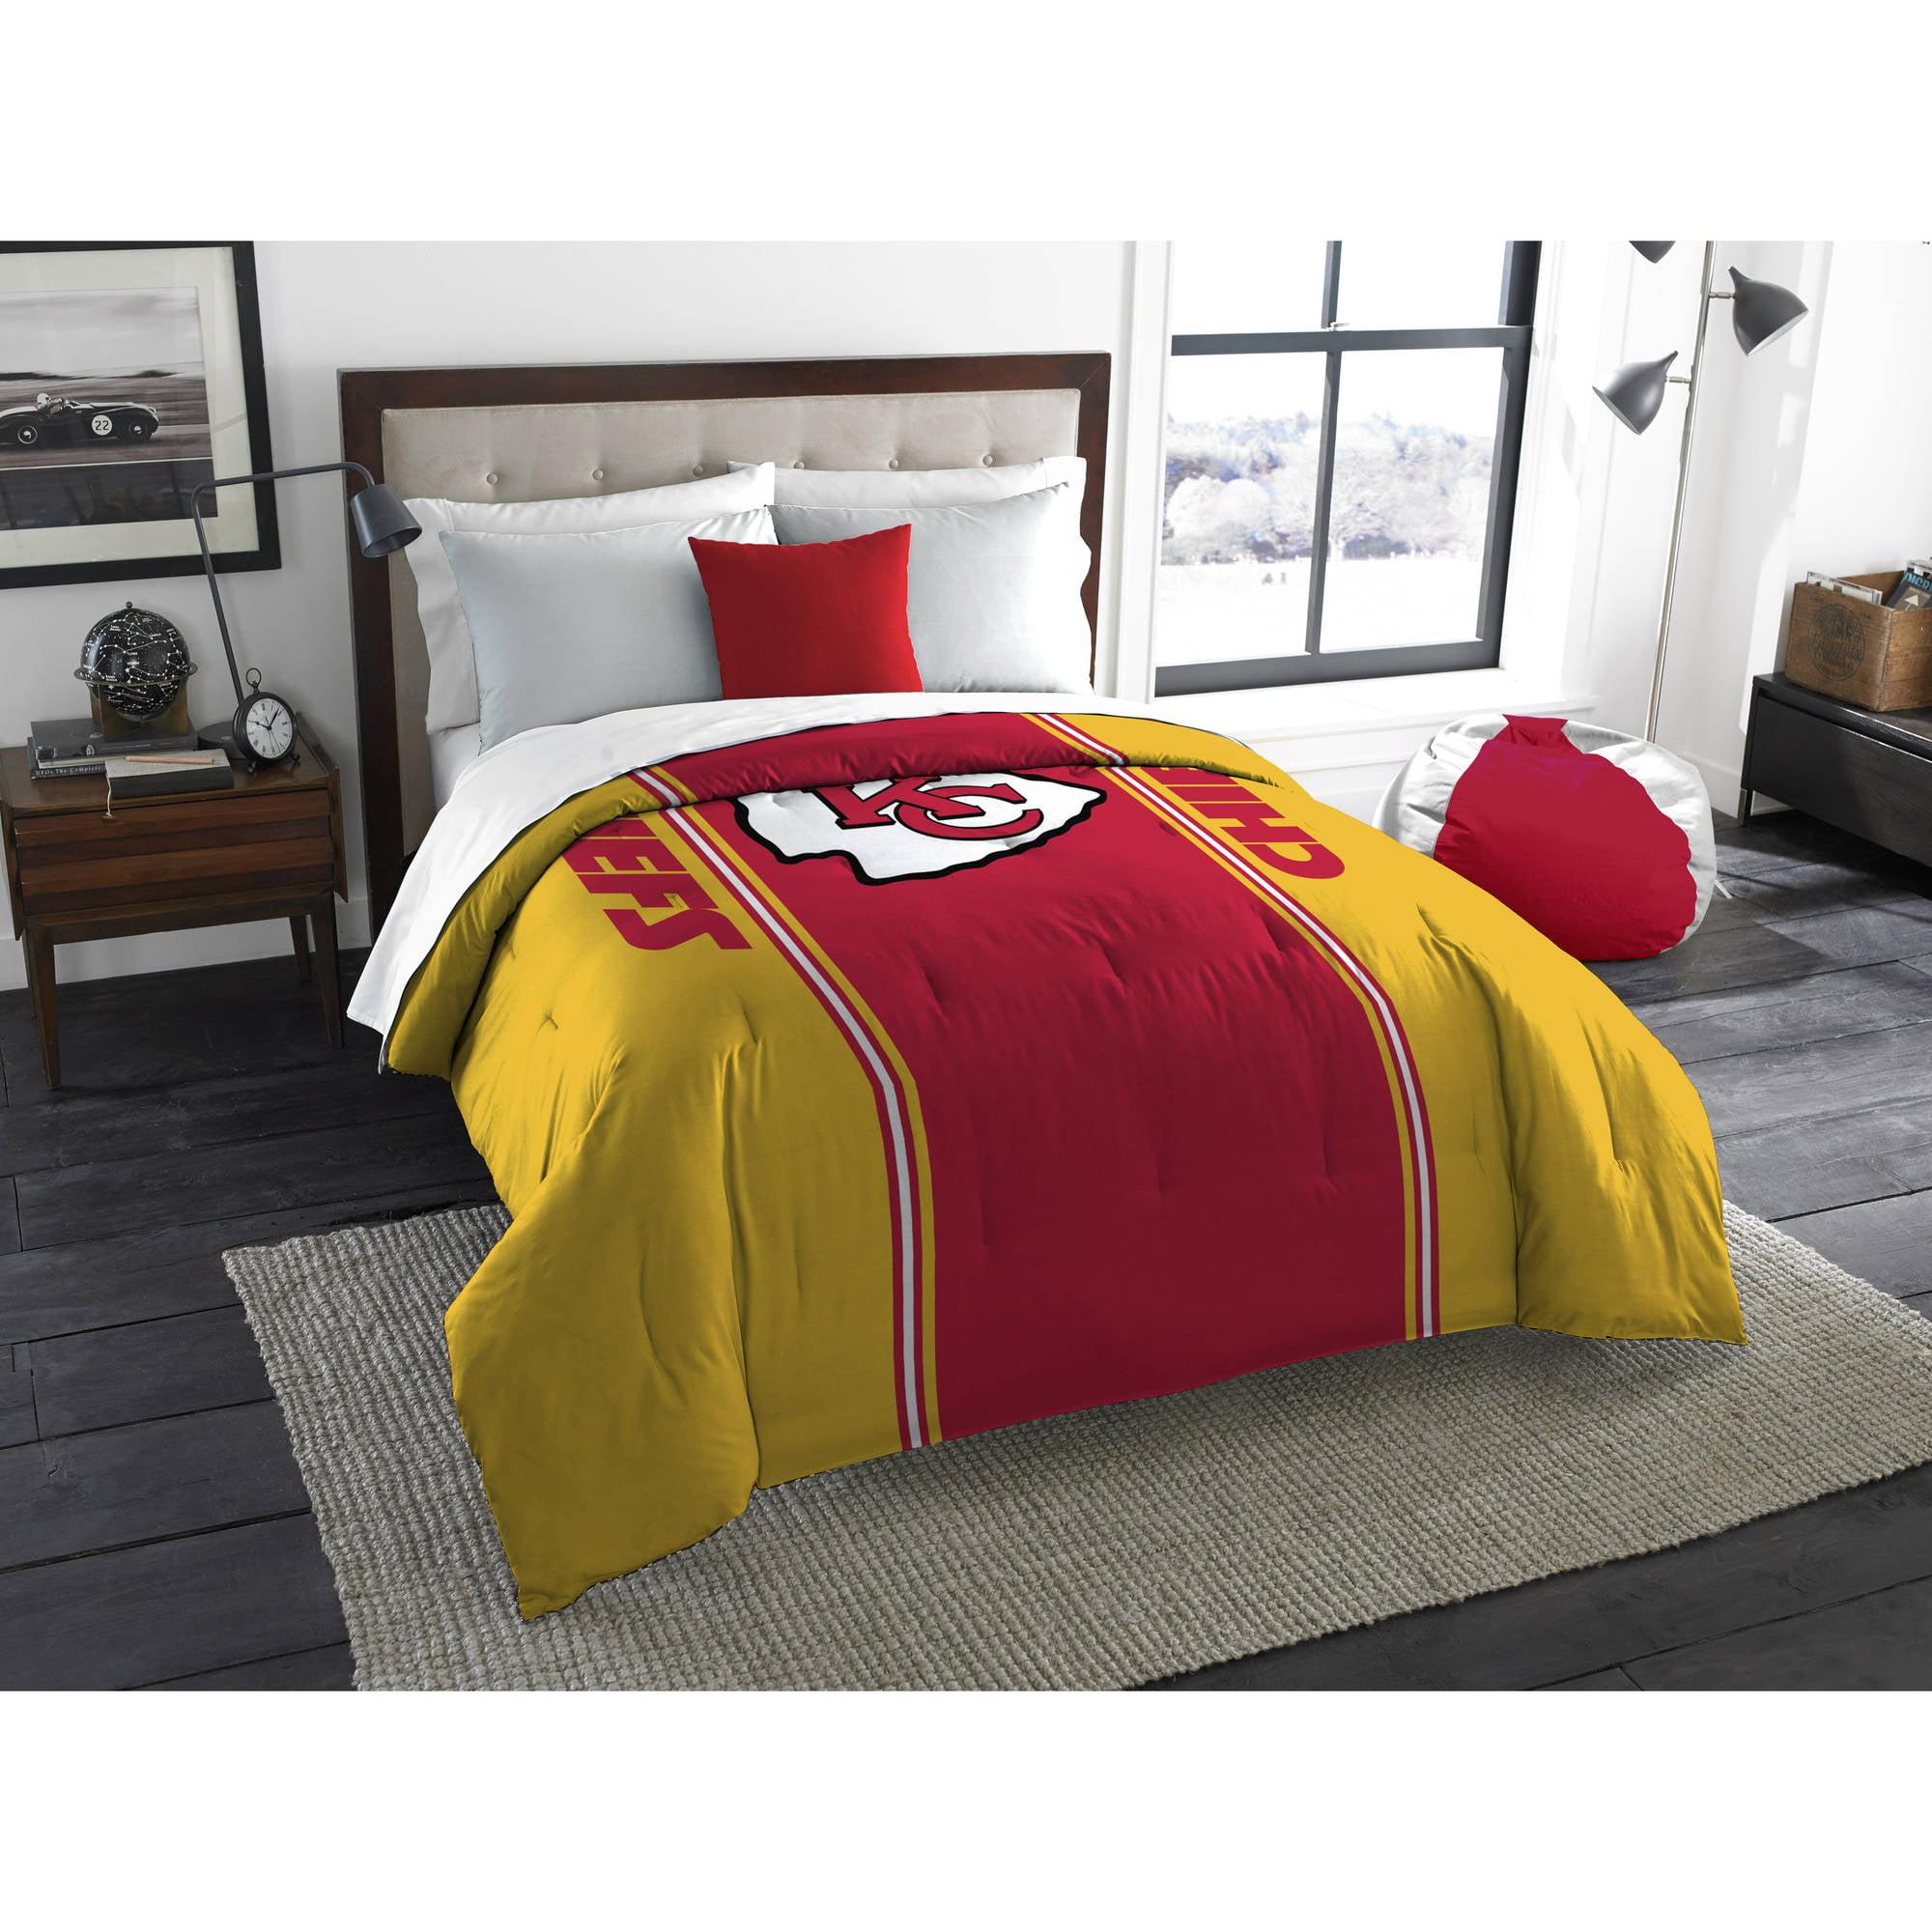 "NFL Kansas City Chiefs ""Mascot"" Twin or Full Bedding Comforter, 1 Each"